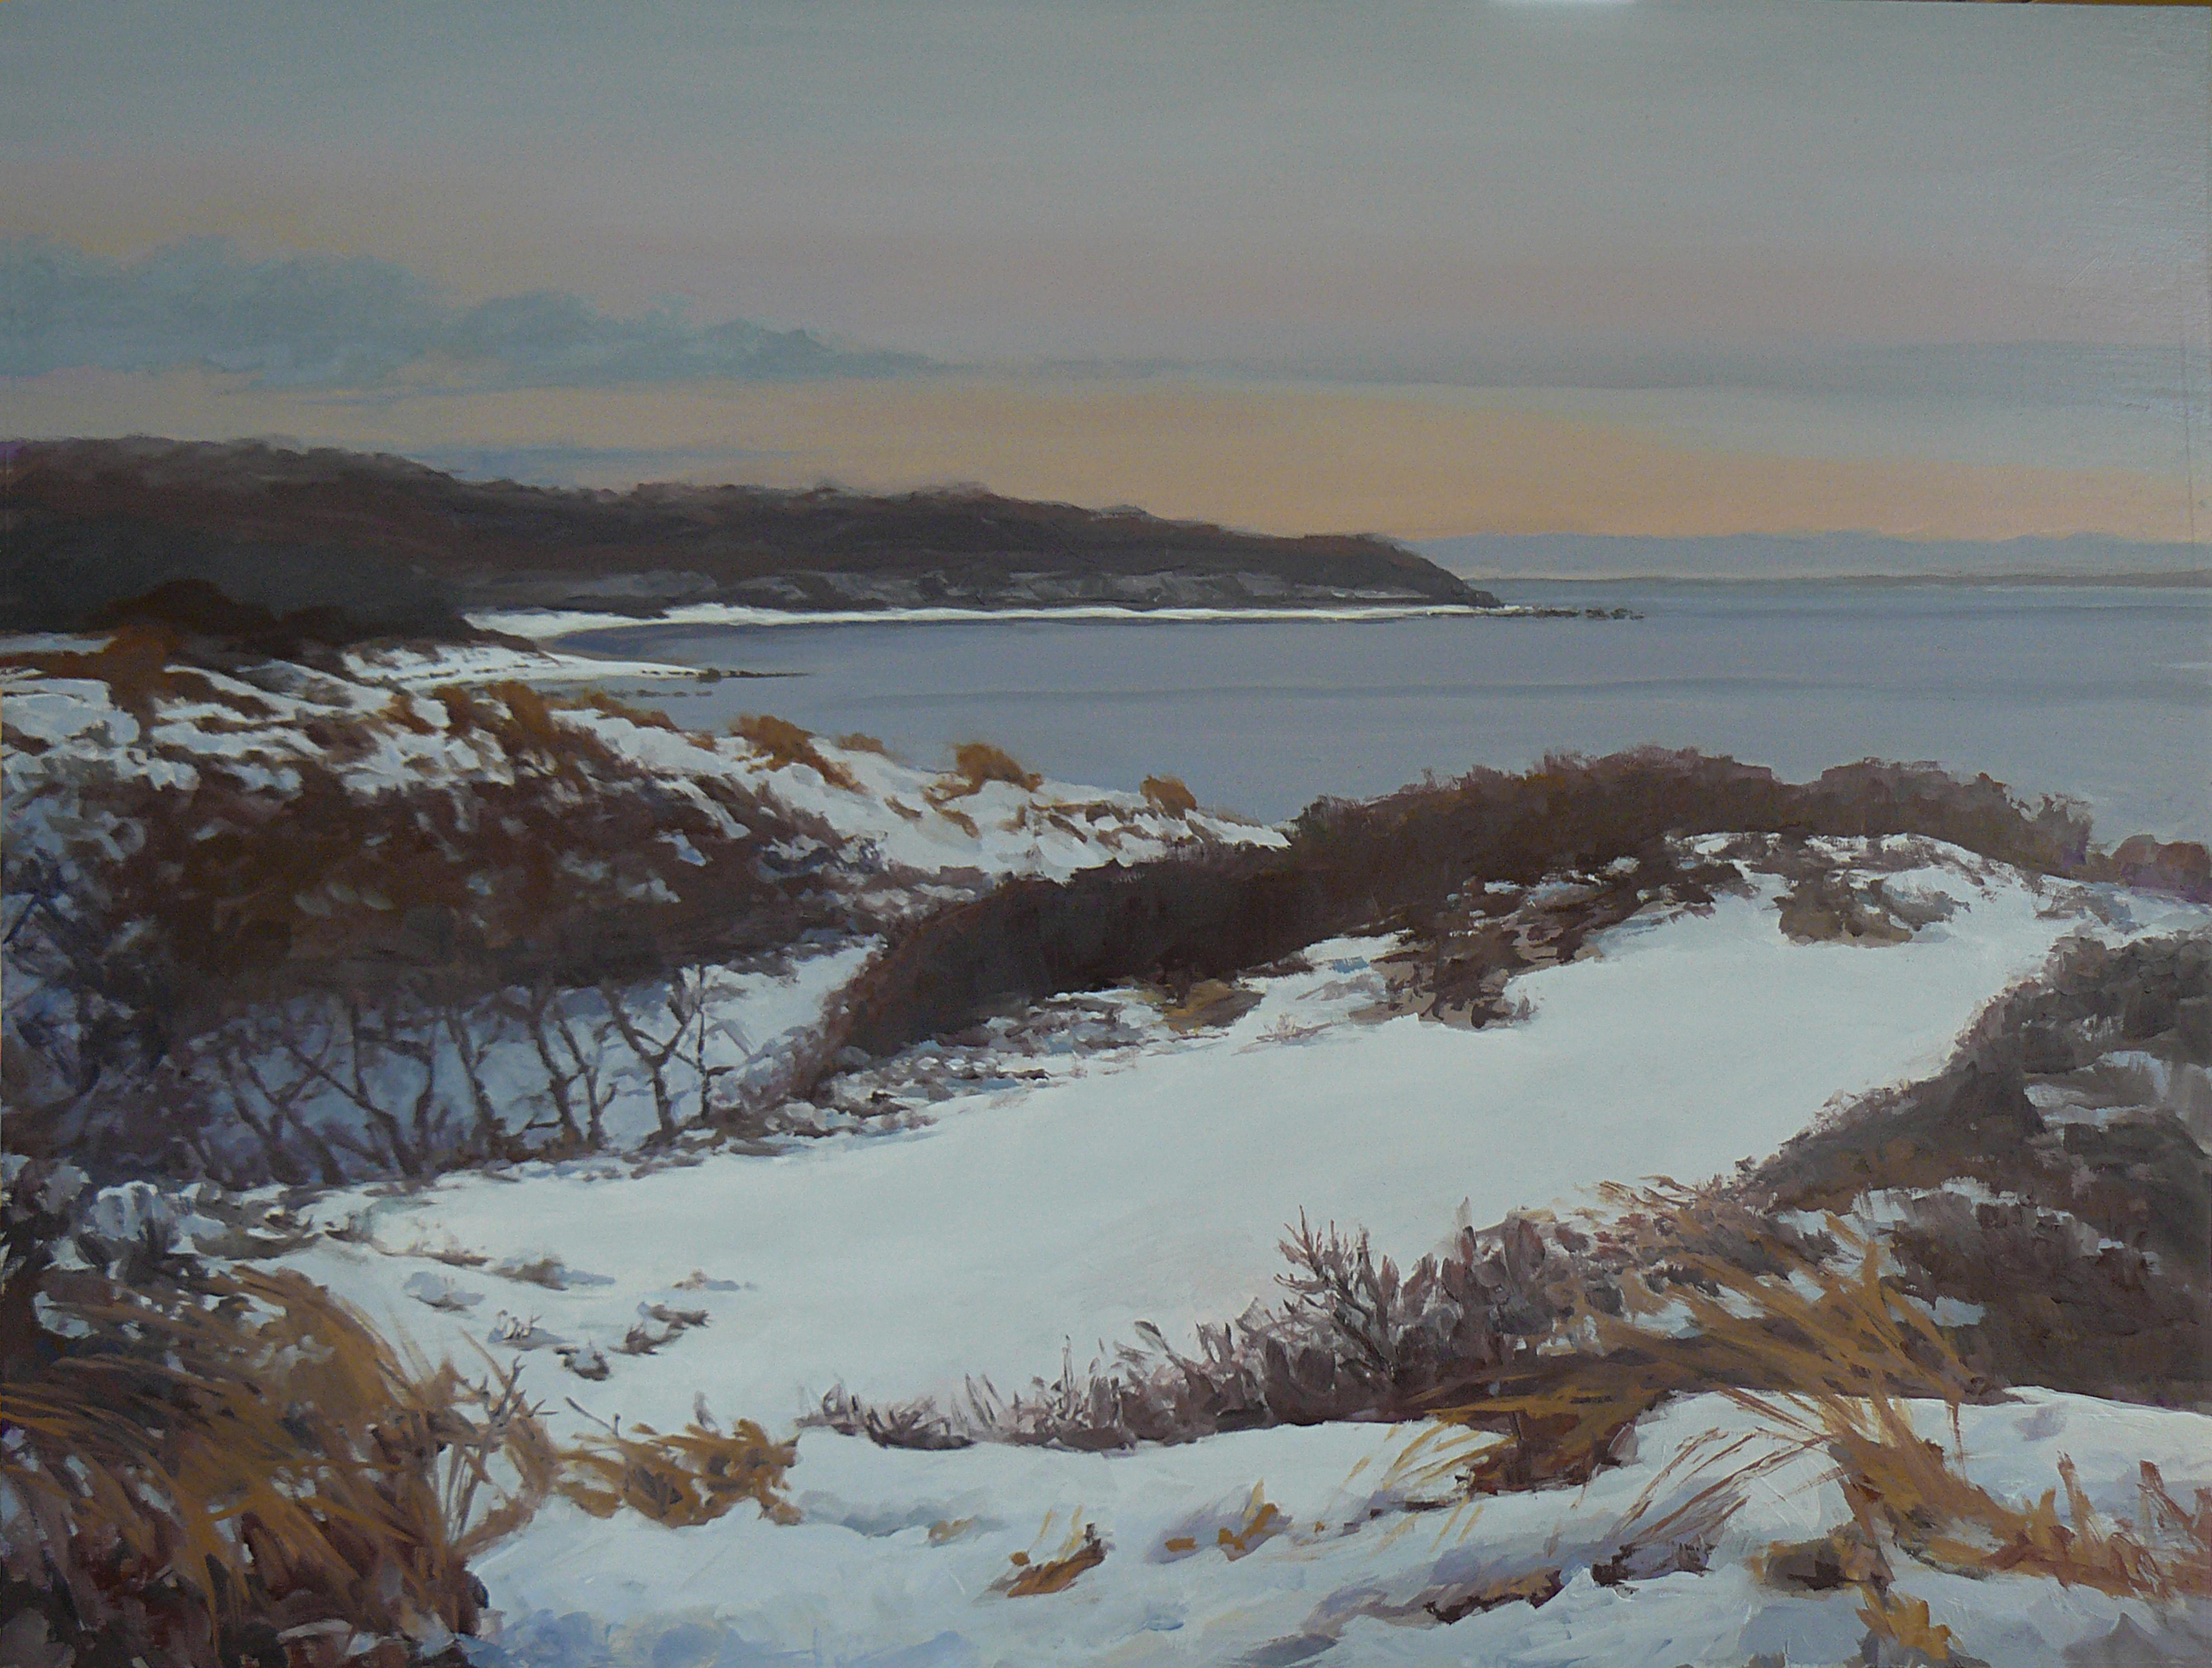 Lambert Cove, February